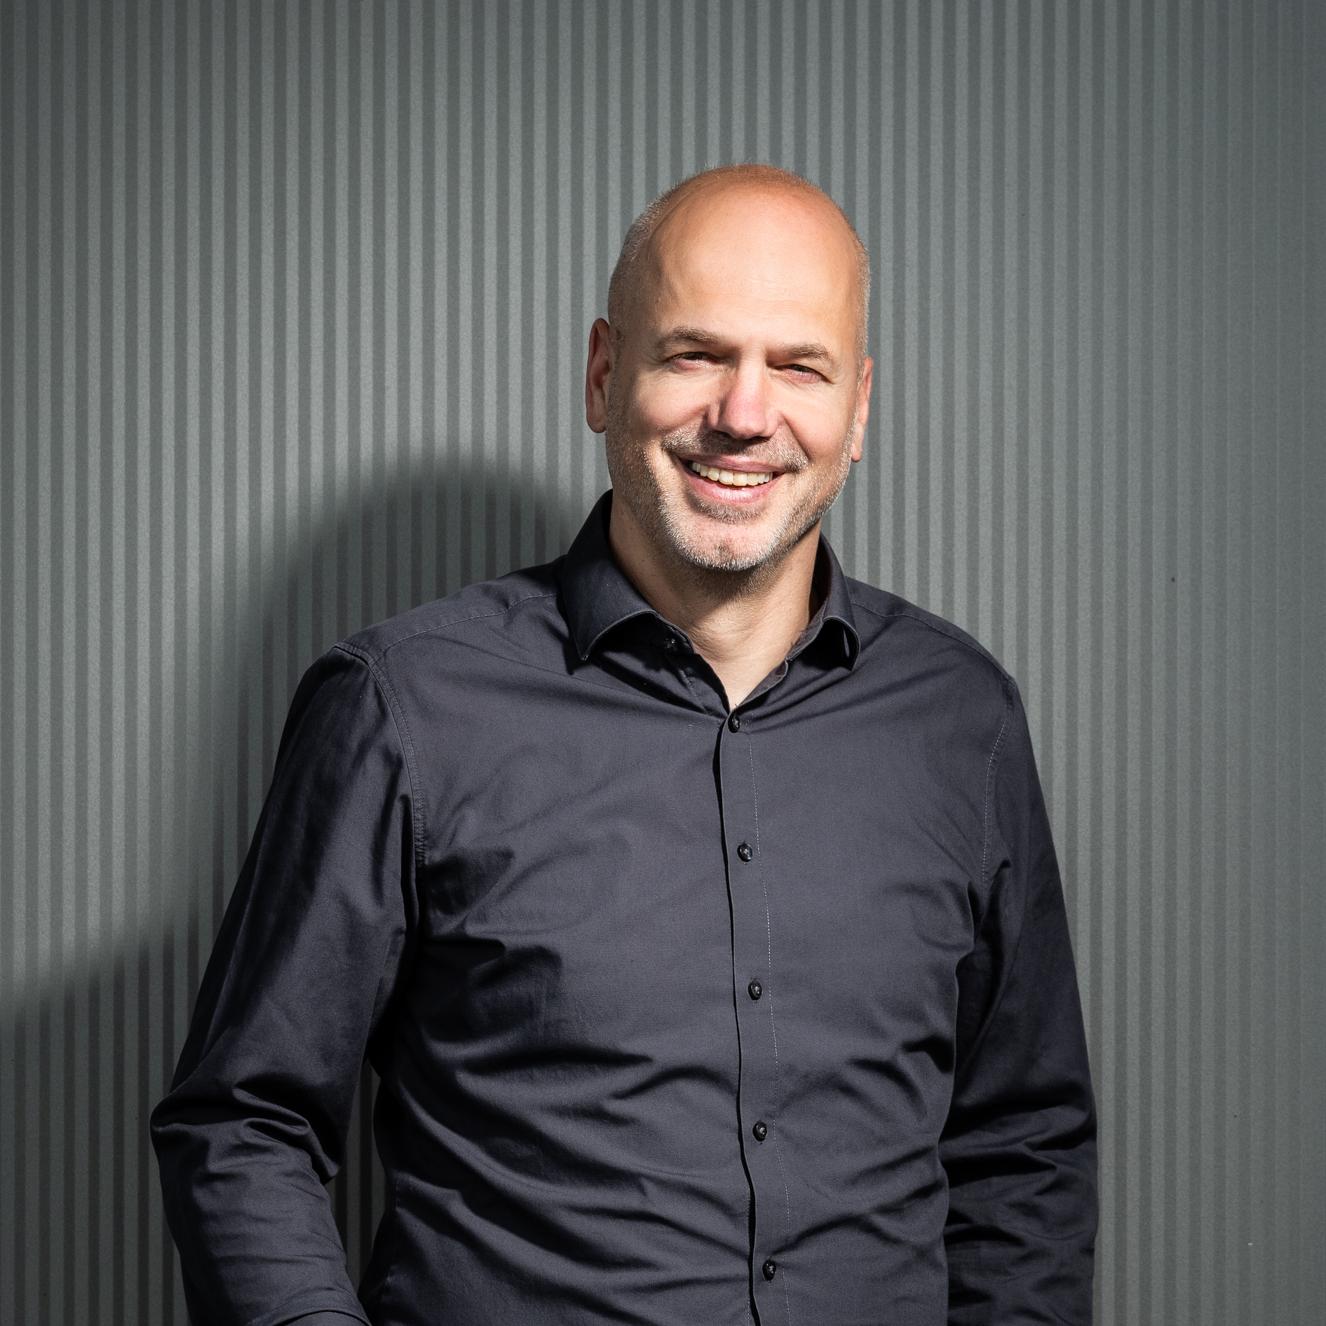 Daniel Varwig